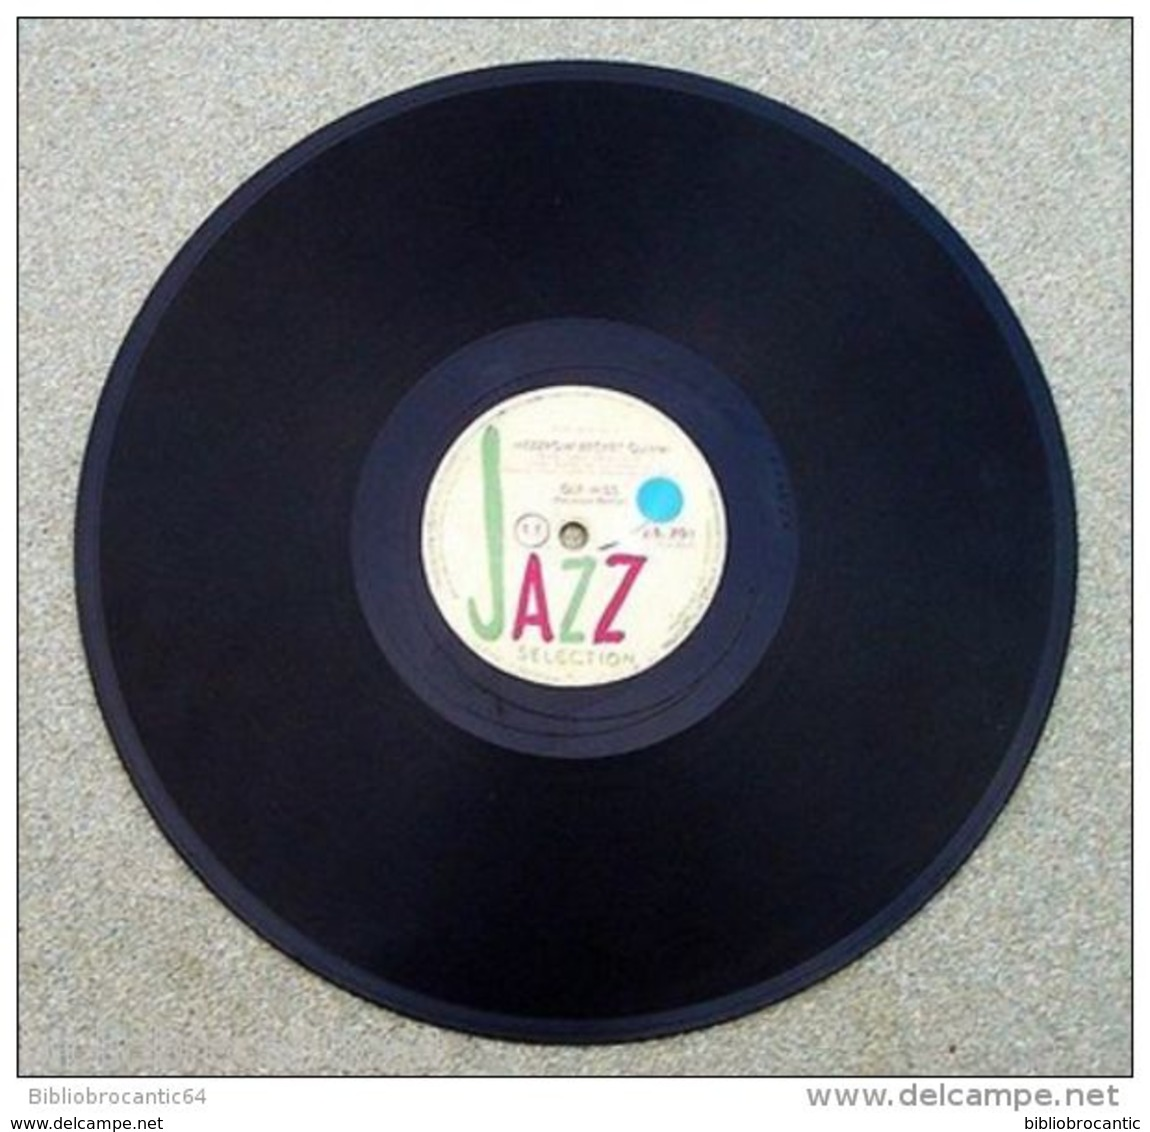 "78 Tours""MEZZROW-BECHET QUINTET* < OLE MISS/ OUT OF THE GALLION < JAZZ SELECTION J.S.701 - 78 Rpm - Schellackplatten"